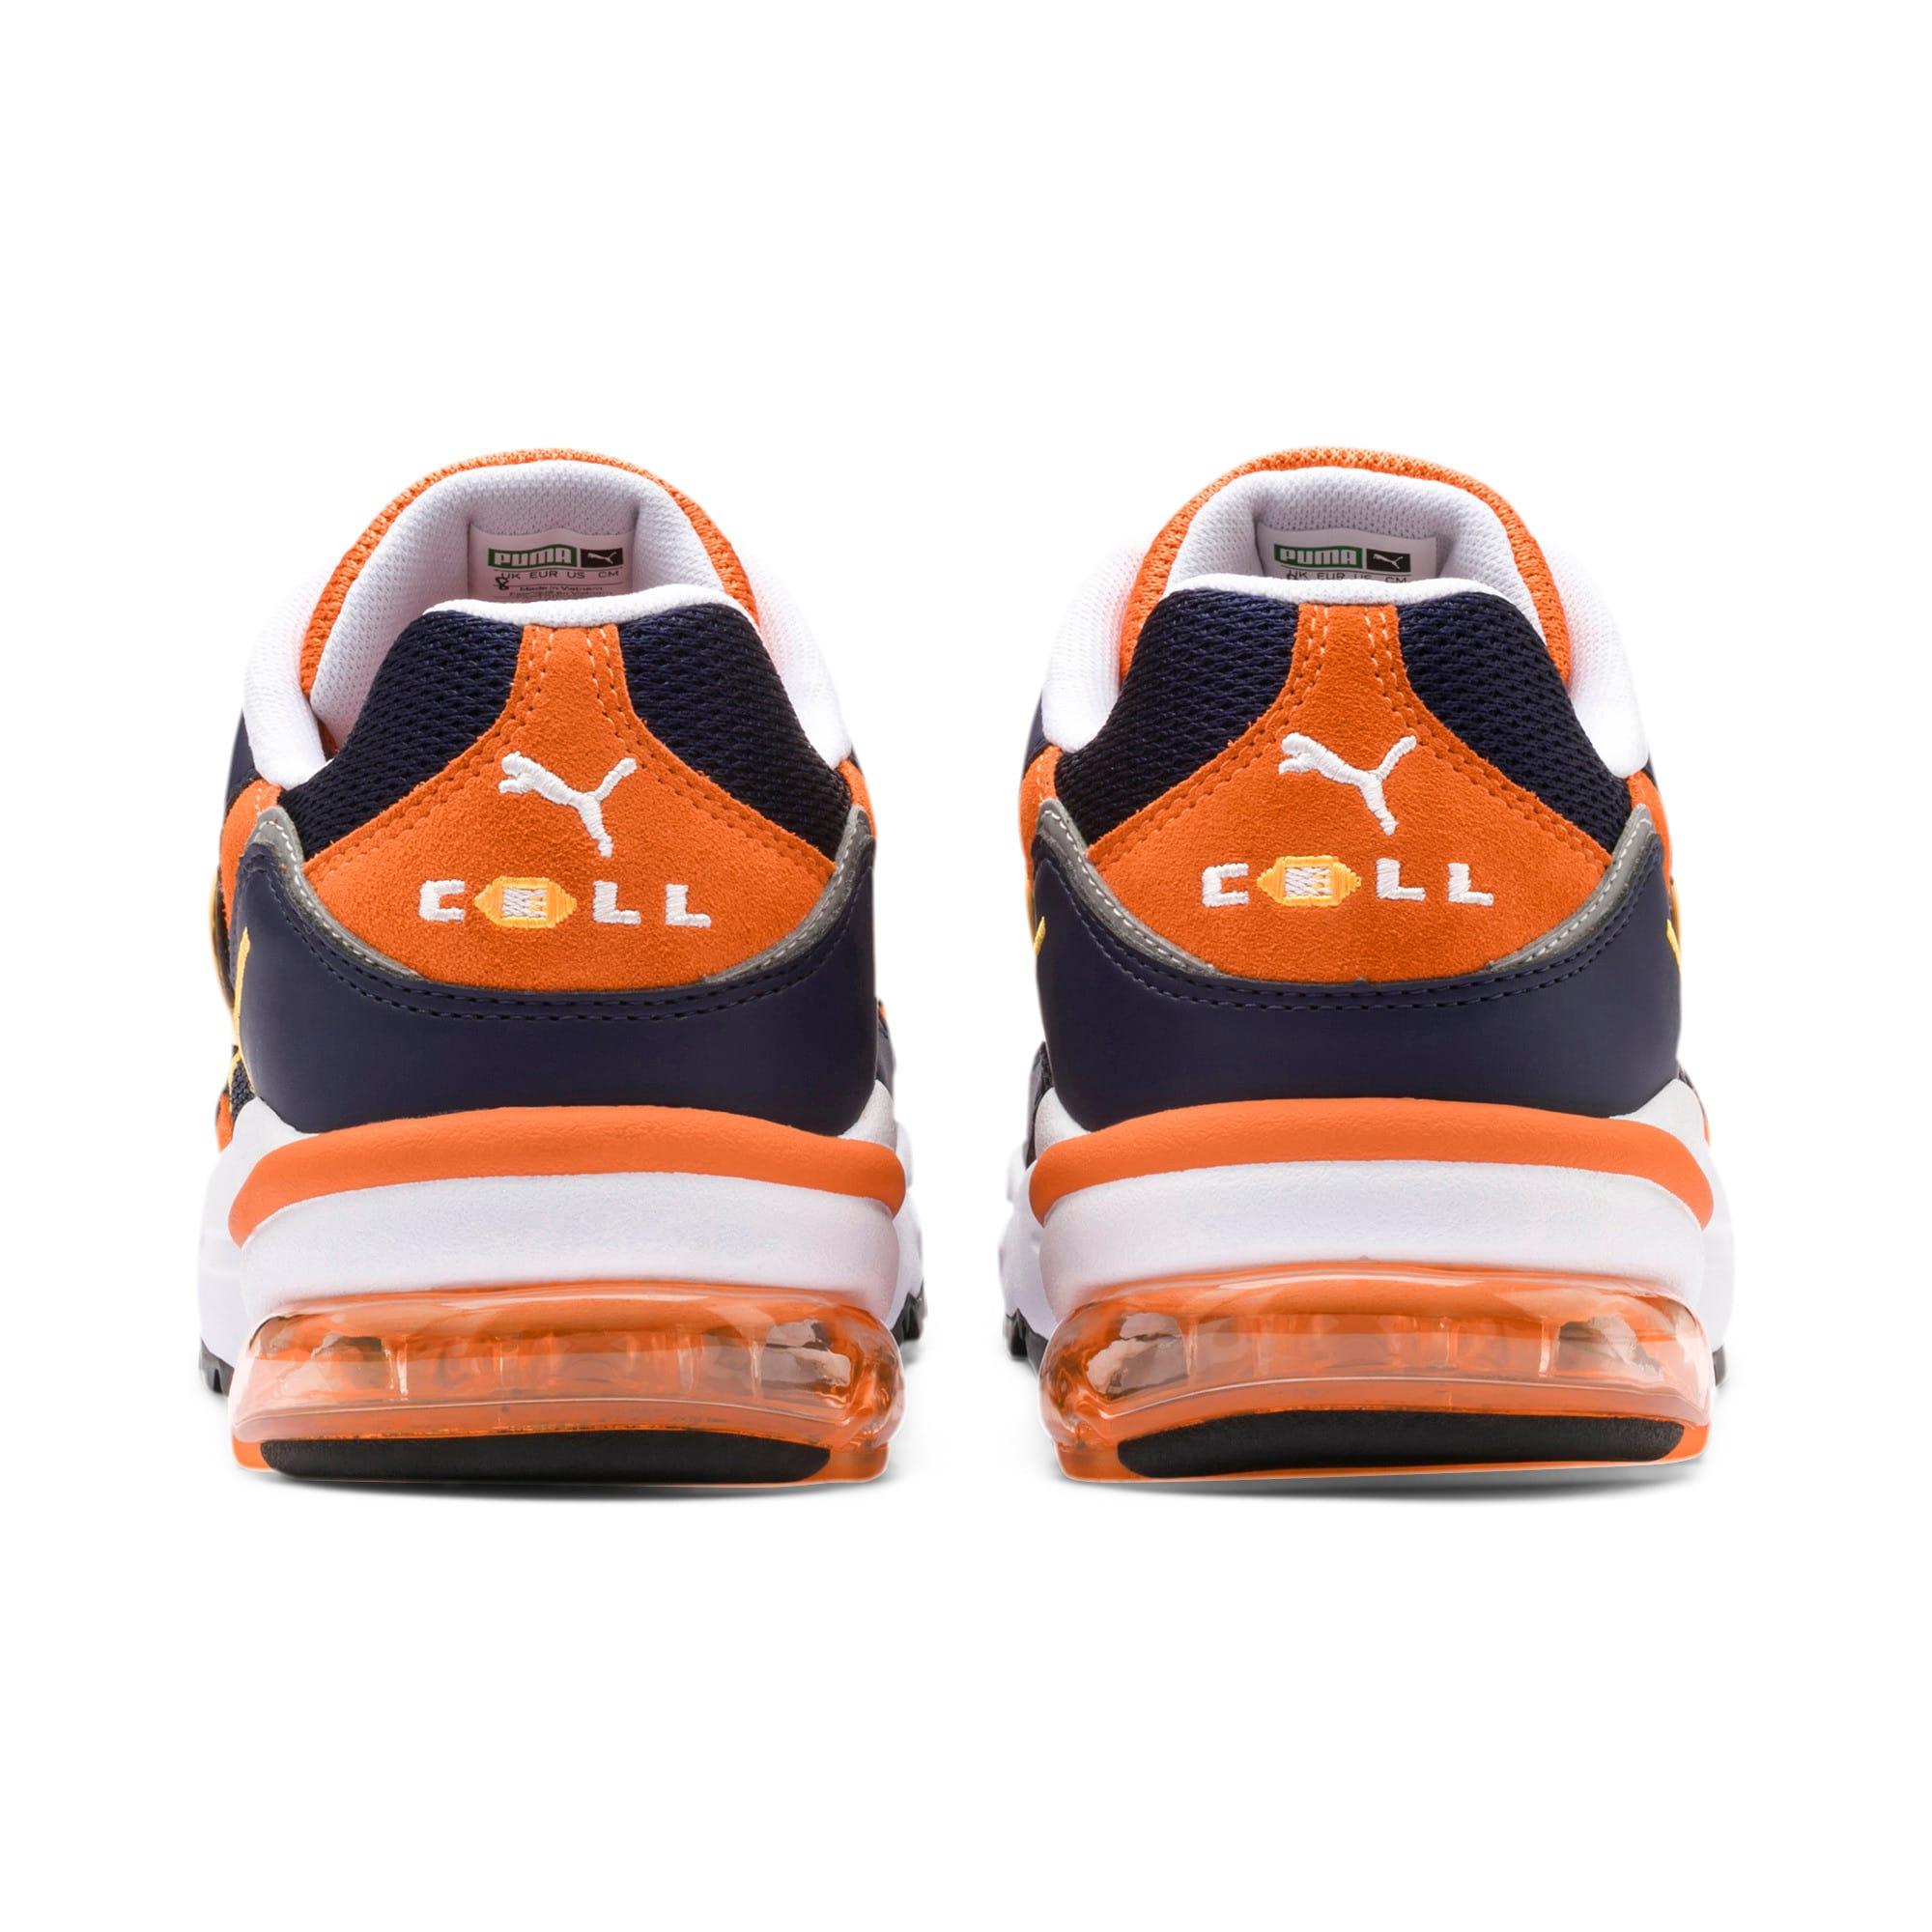 Thumbnail 4 of CELL Ultra OG Pack Sneakers, Peacoat-Jaffa Orange, medium